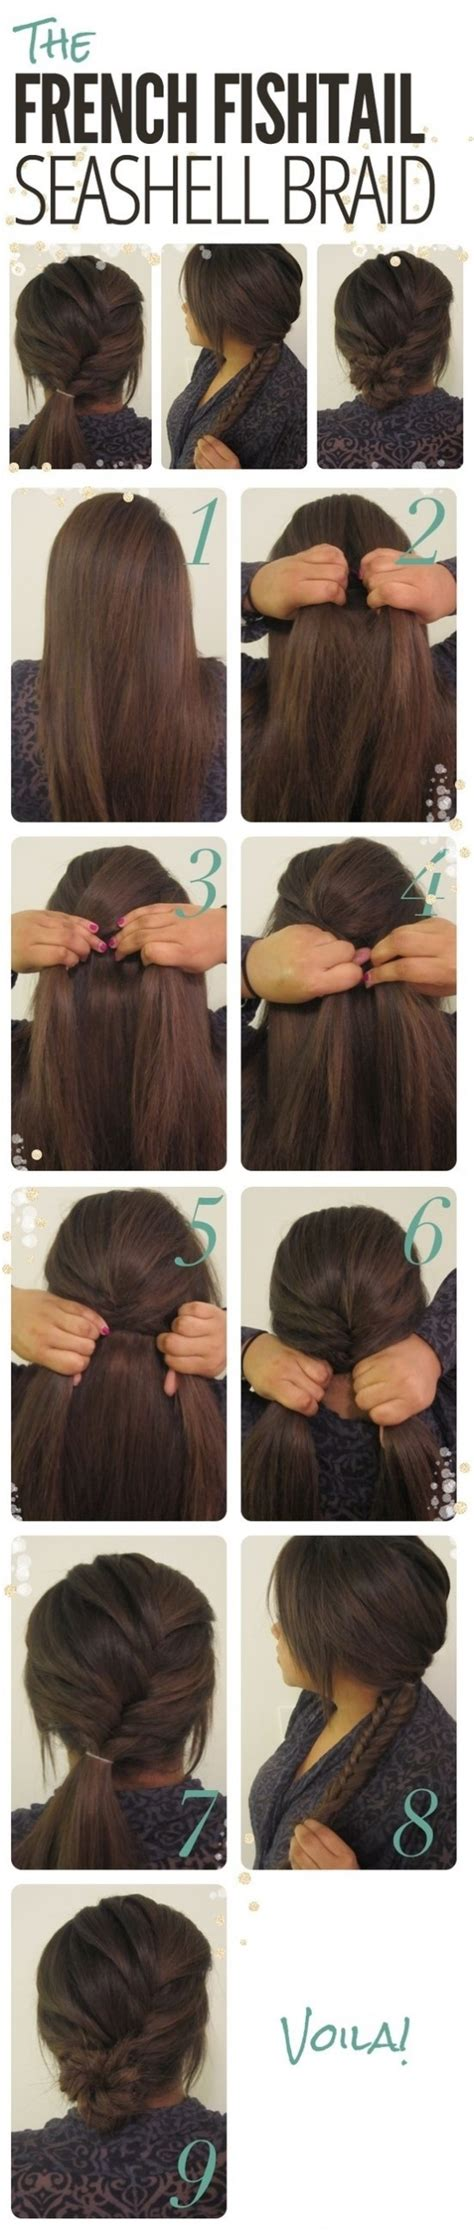 cobra braid side ponytail cute girls bridal hairstyles